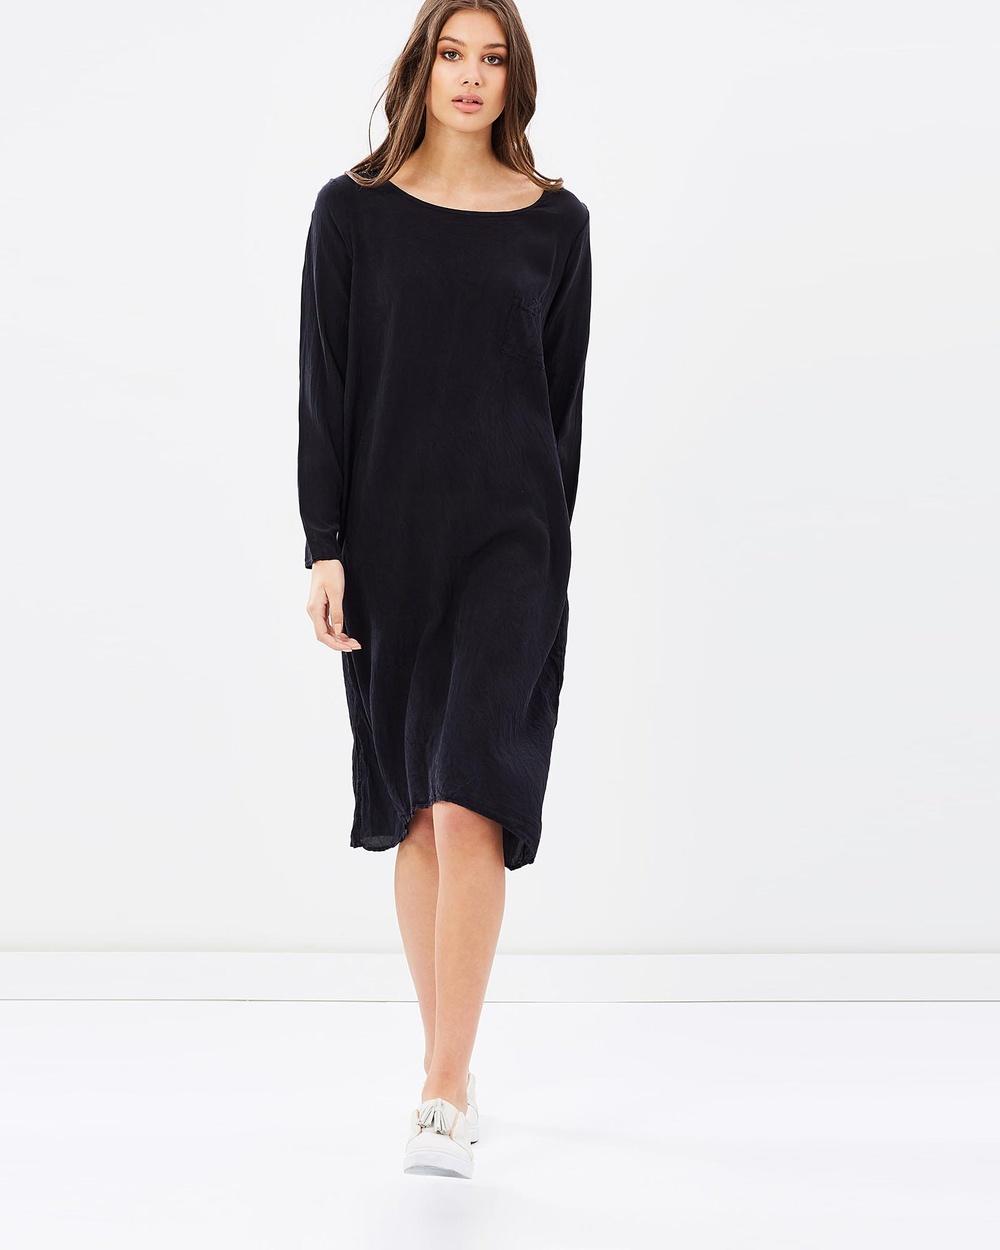 Primness Slouched Dress Dresses Black Slouched Dress